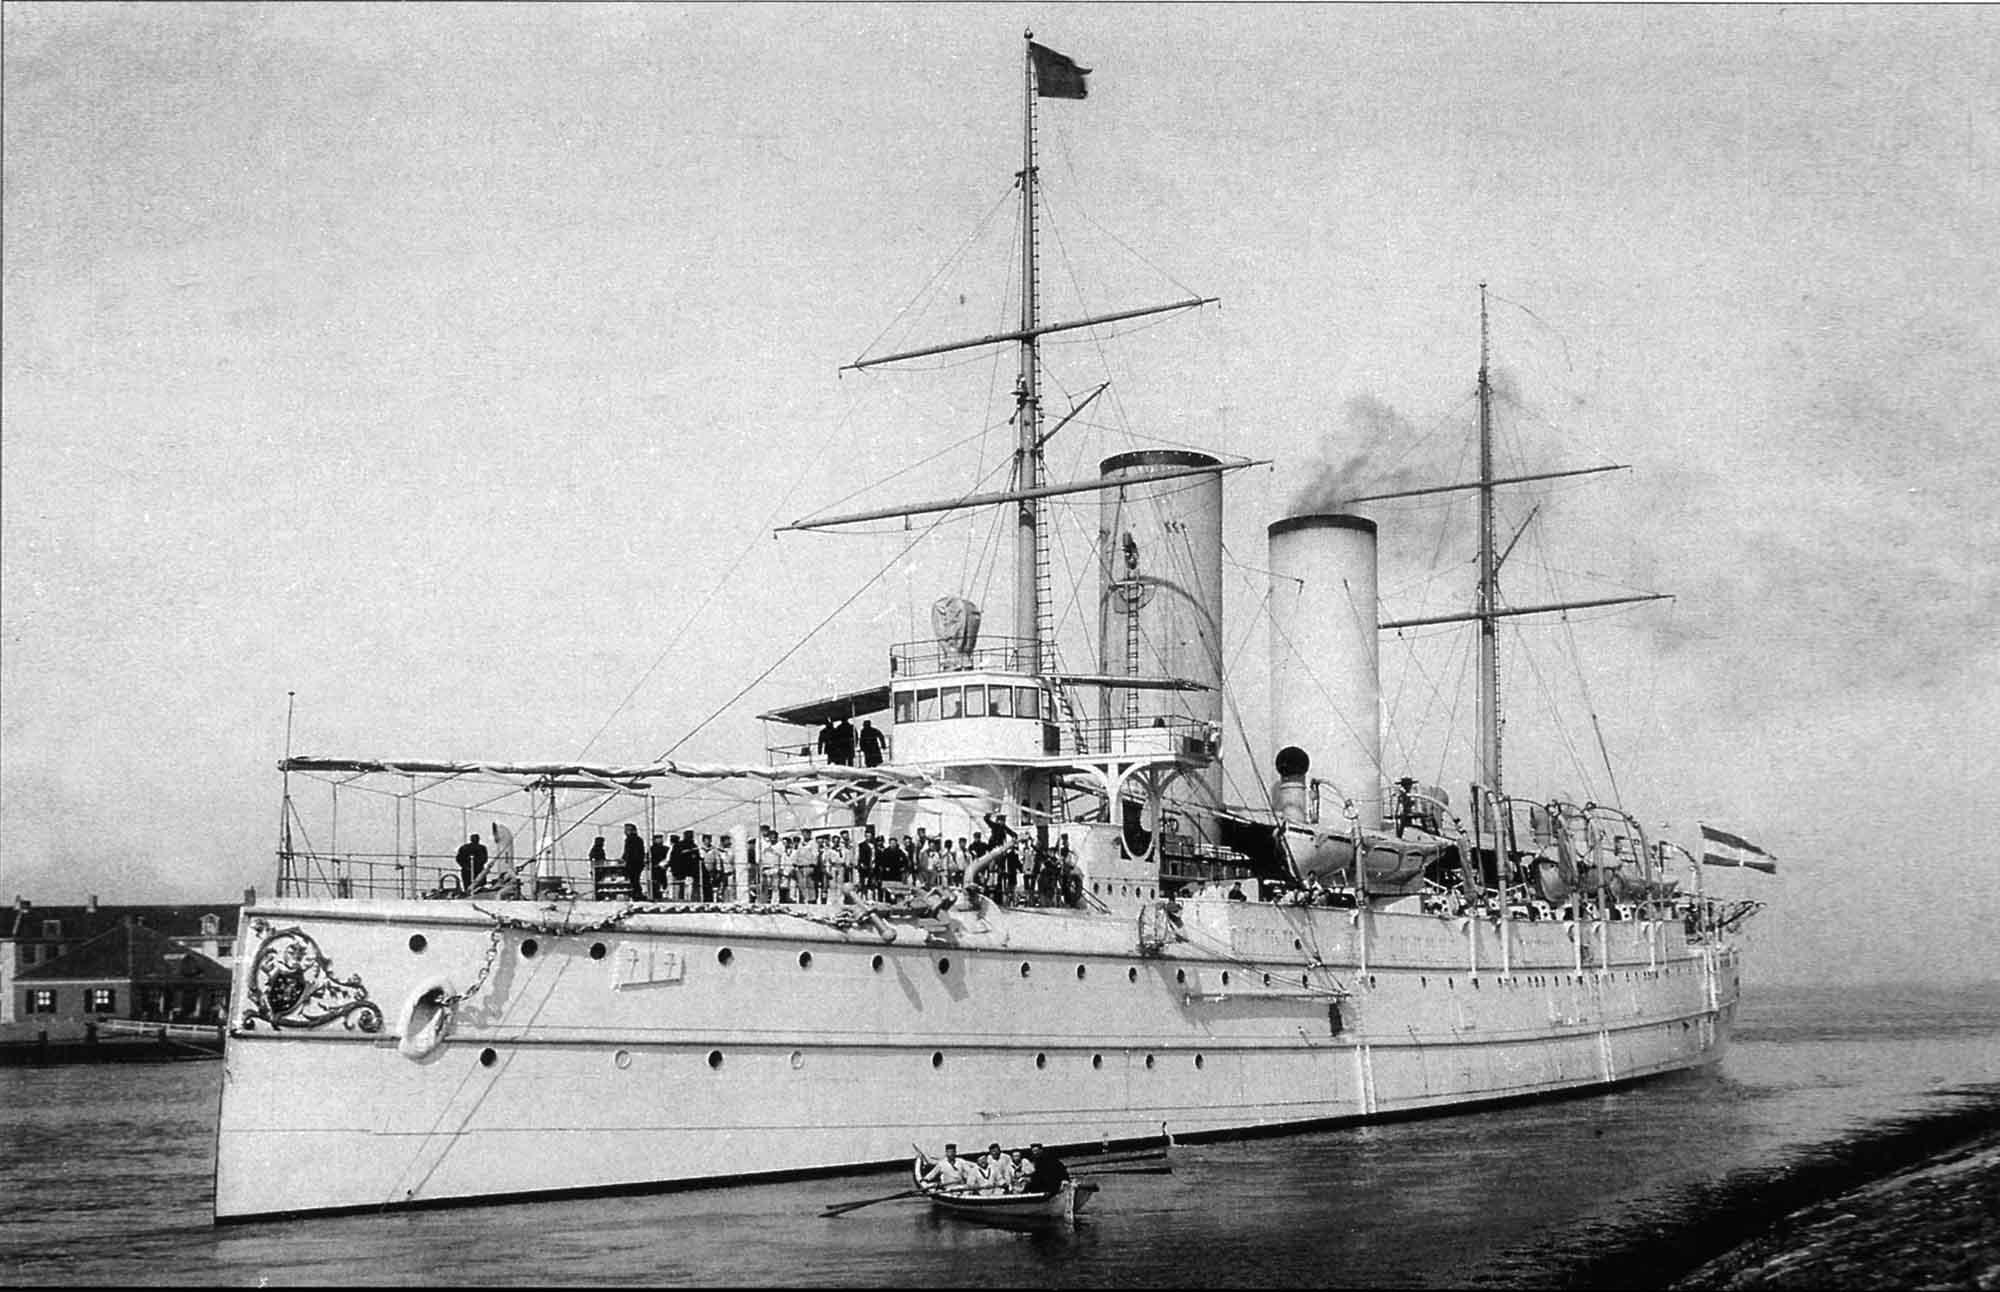 Holland class cruisers